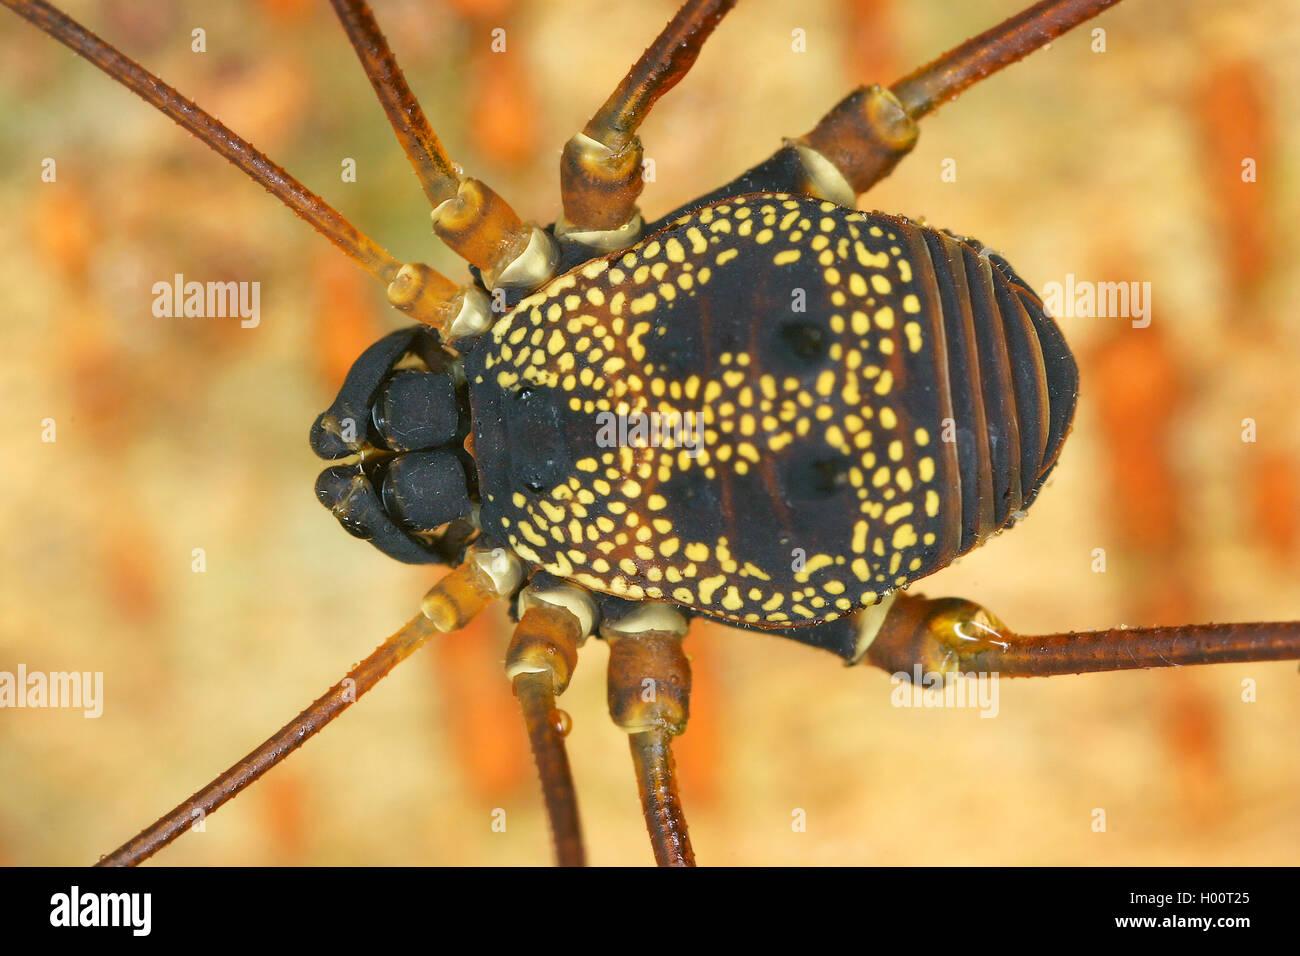 Weberknecht, Paecilaema chiriquiense (Paecilaema chiriquiense), Koerper, Costa Rica | harvestman (Paecilaema chiriquiense), - Stock Image